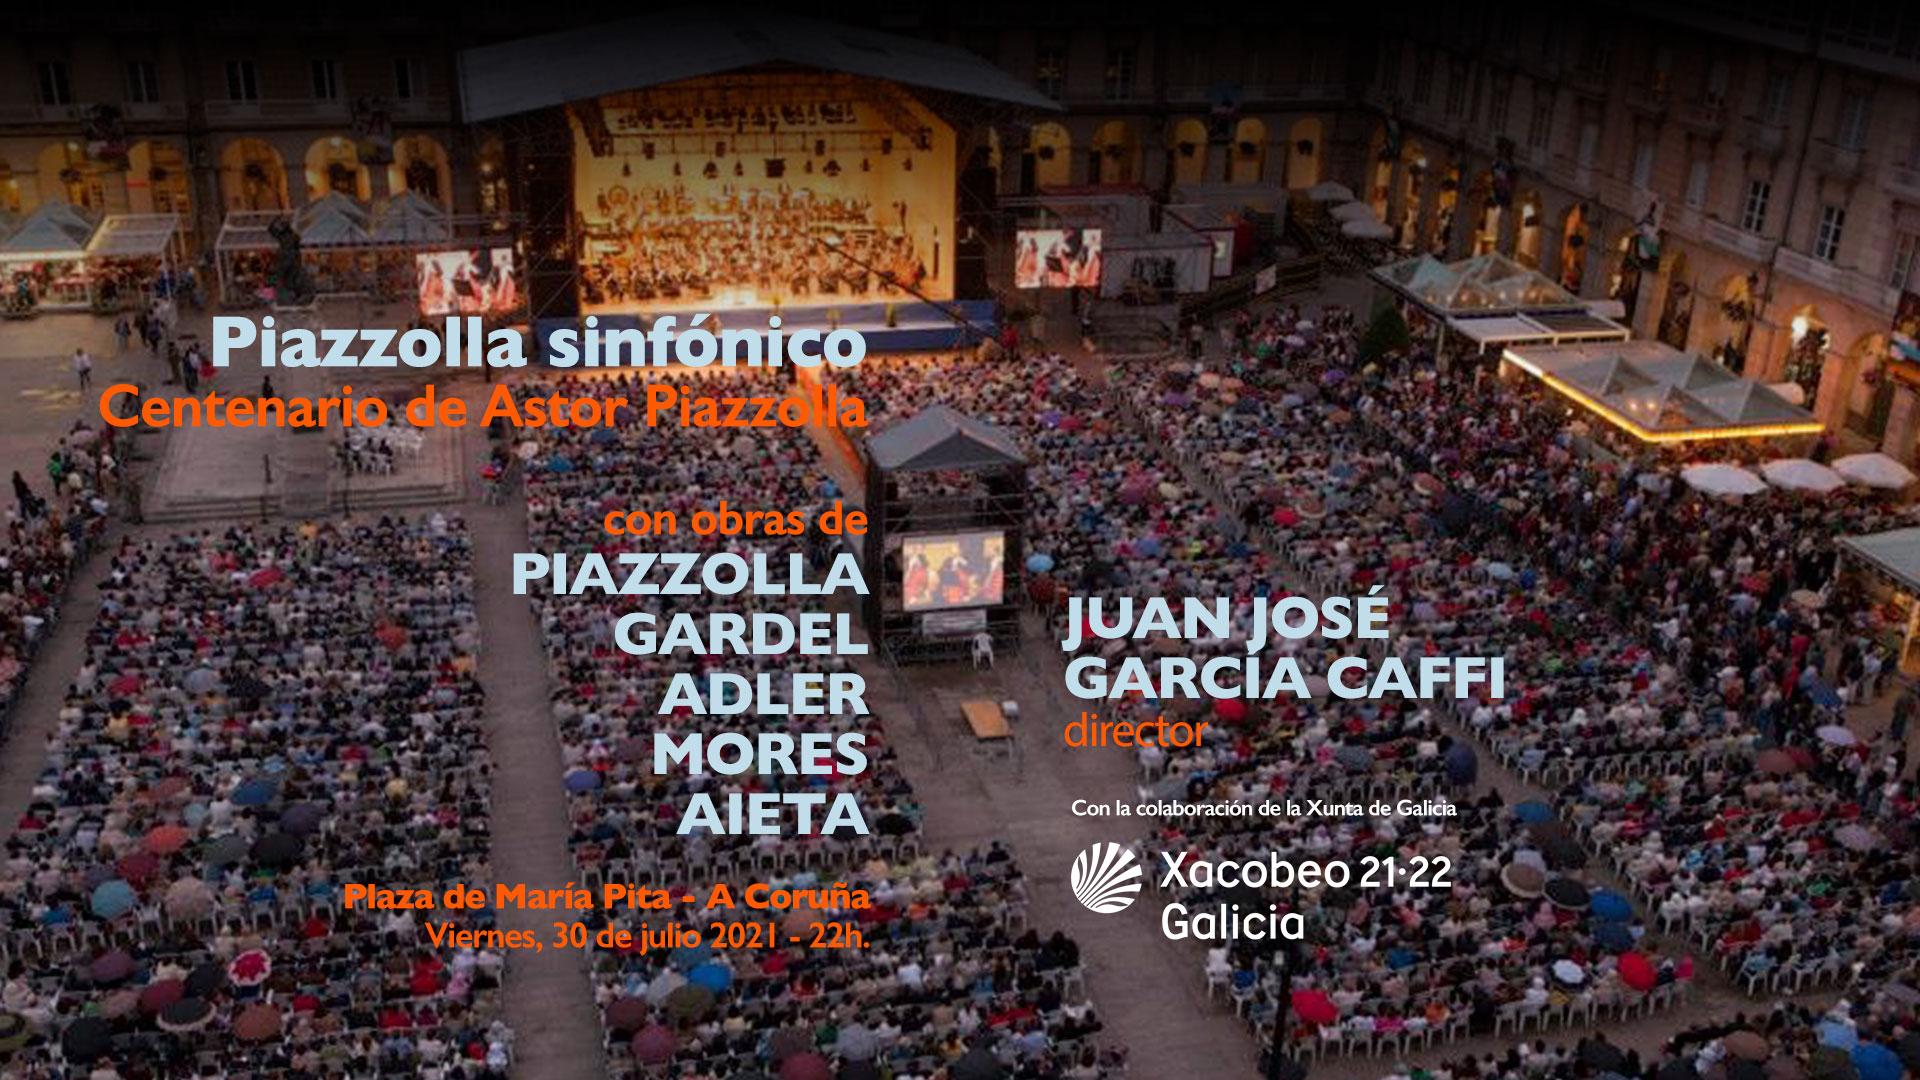 Orquesta Sinfónica de Galicia - Piazzolla Sinfónico - Xacobeo 21-22